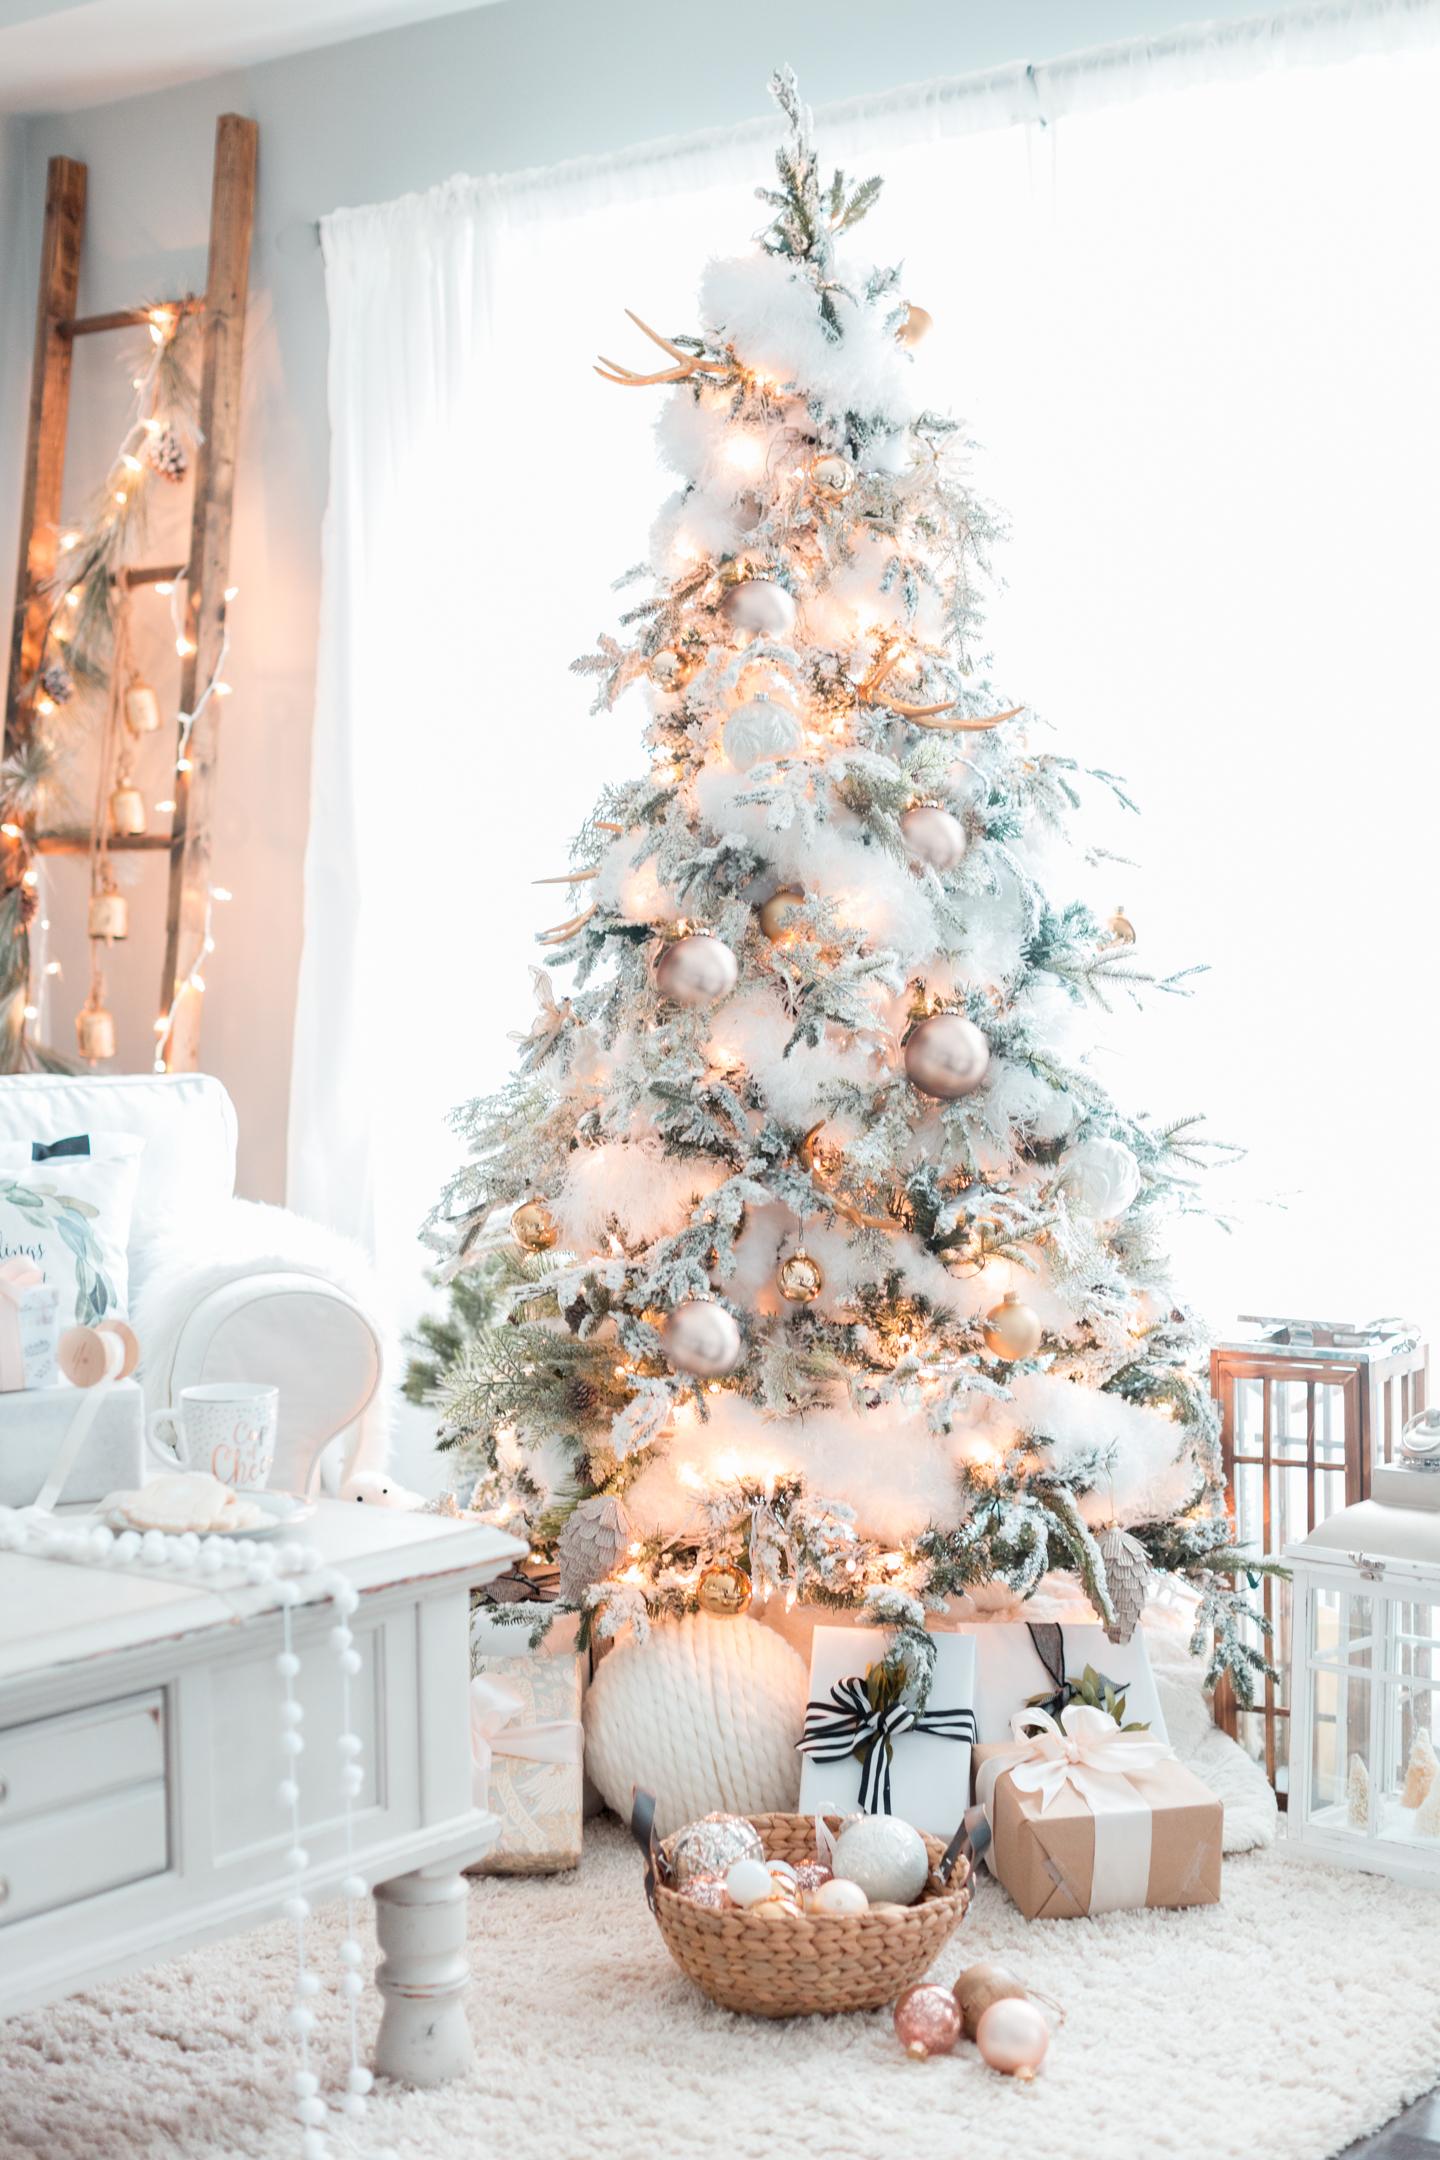 Stunning White Christmas Tree Ideas To Make Yours Shine